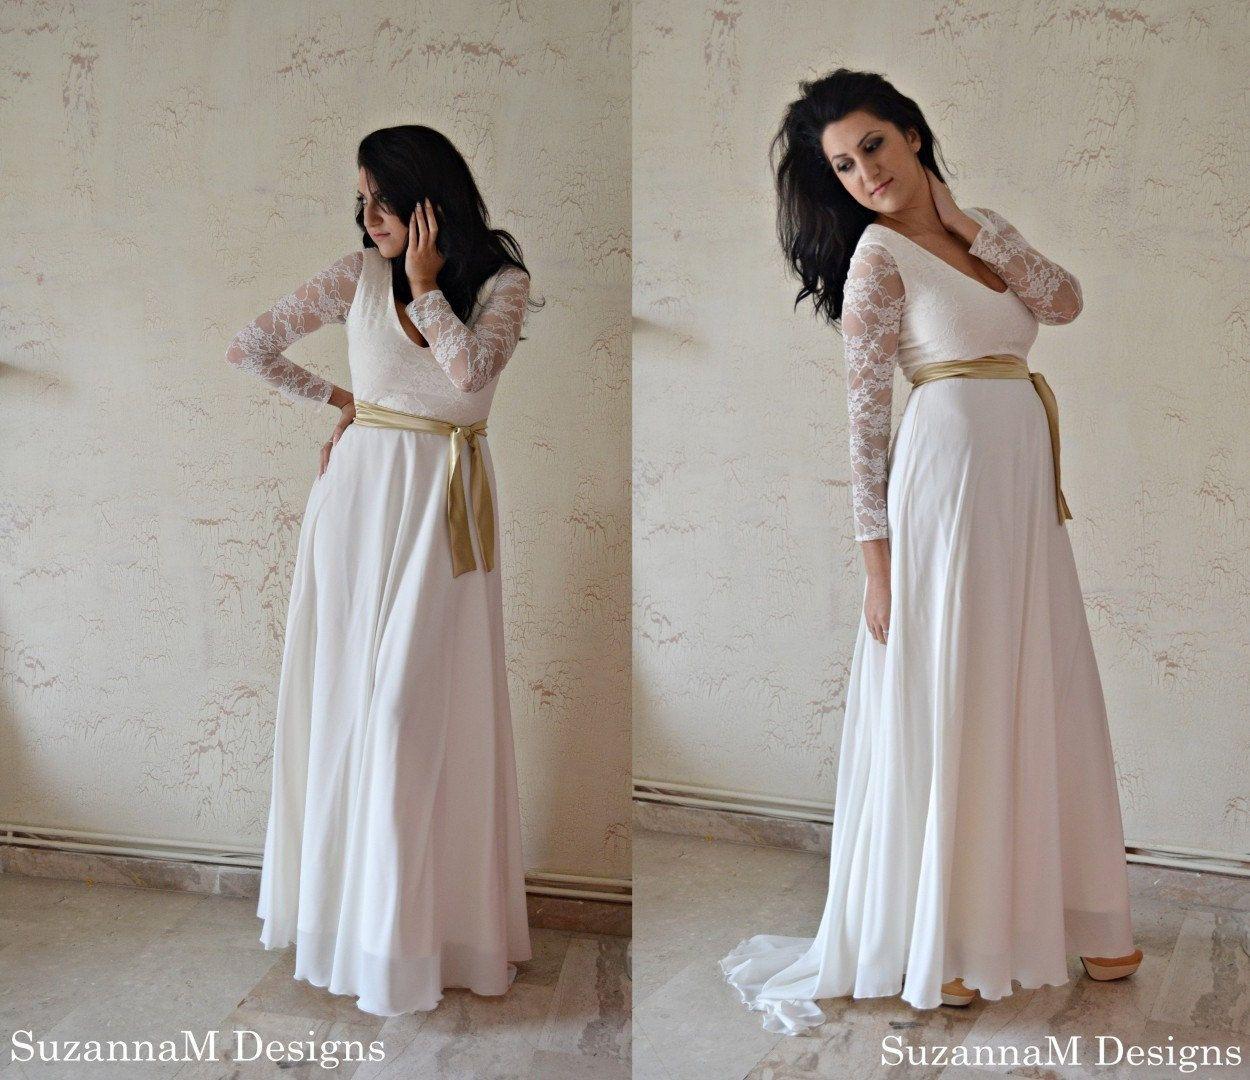 boho wedding dress, lace wedding dress, simple wedding dress